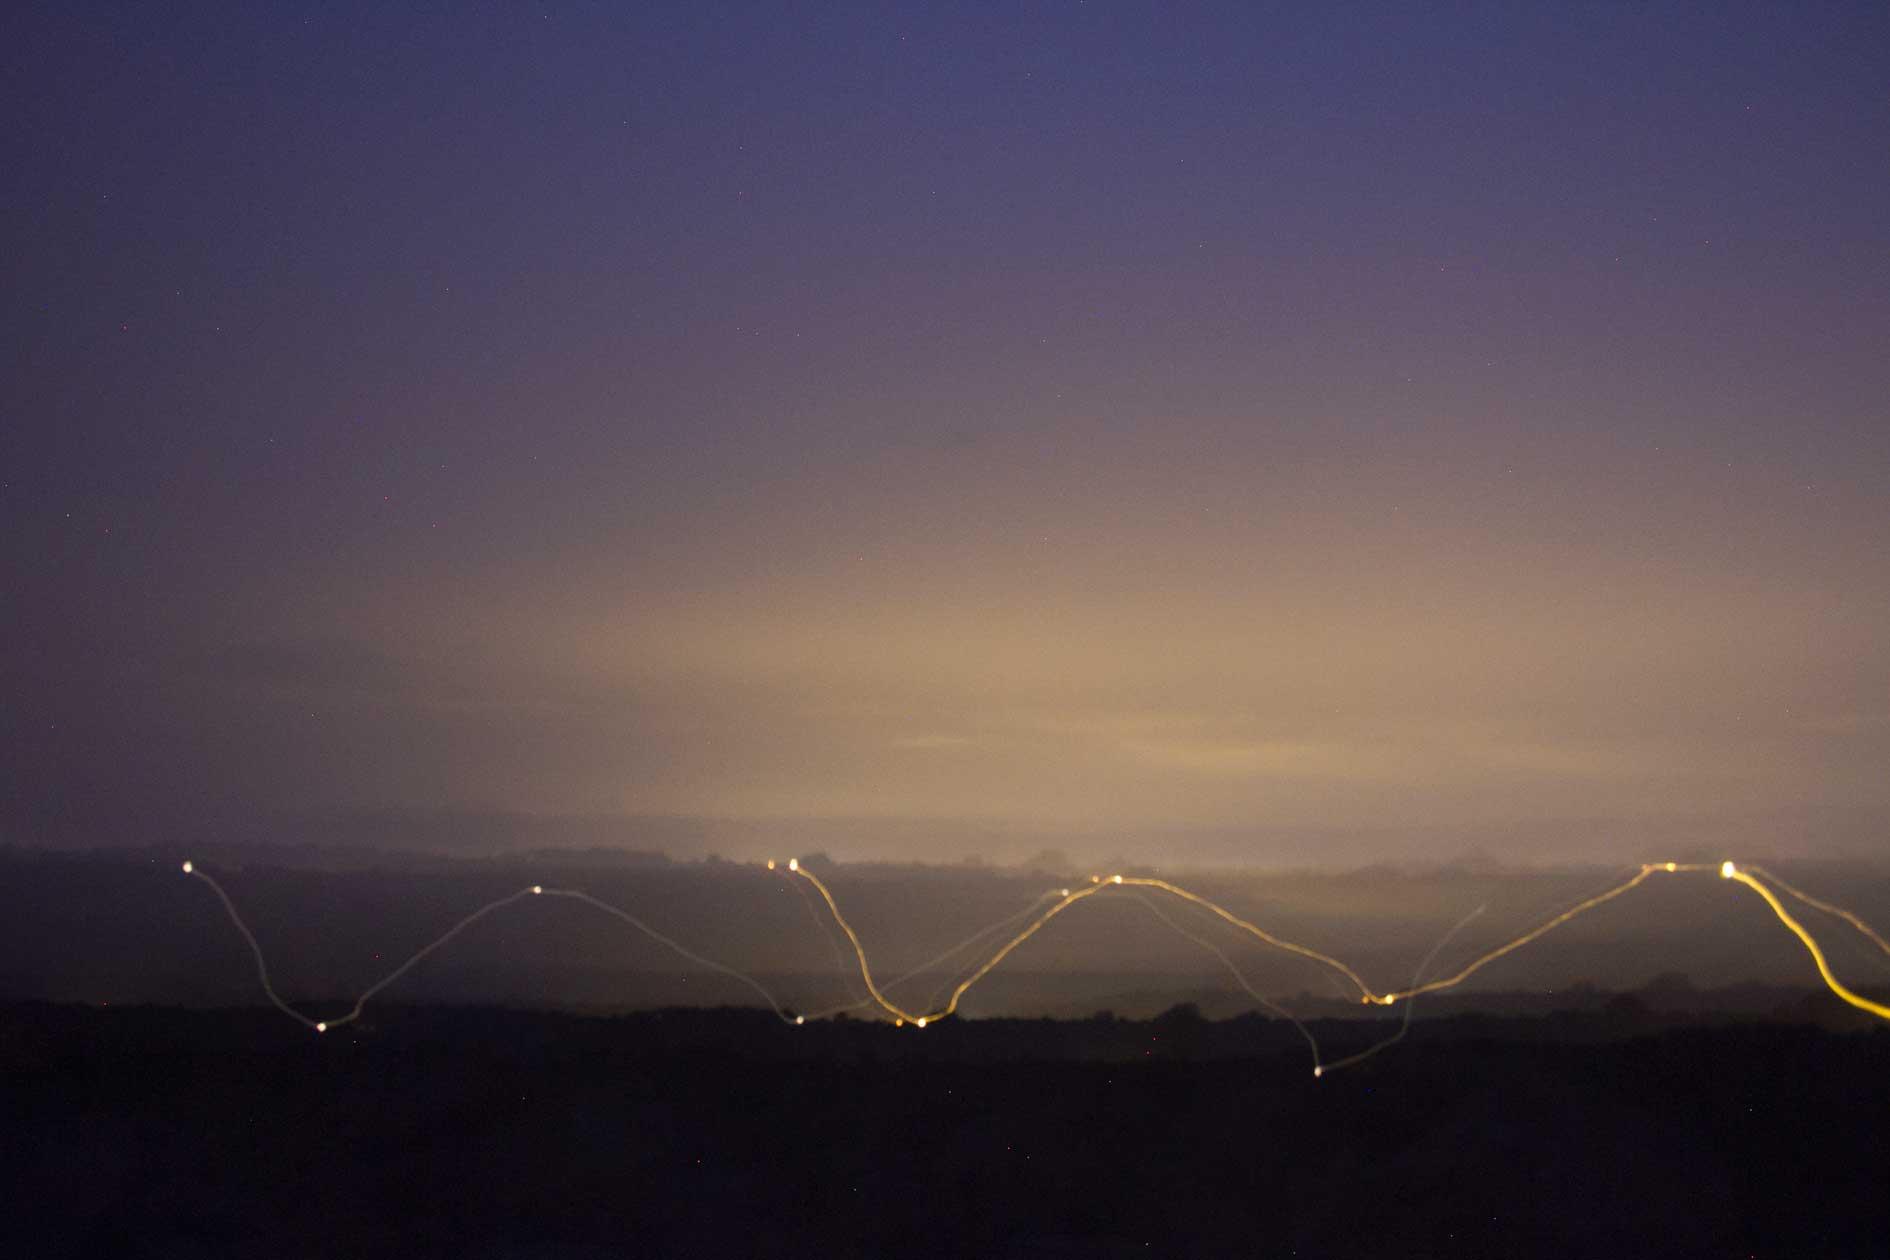 aurora-and-light-painting-11.jpg